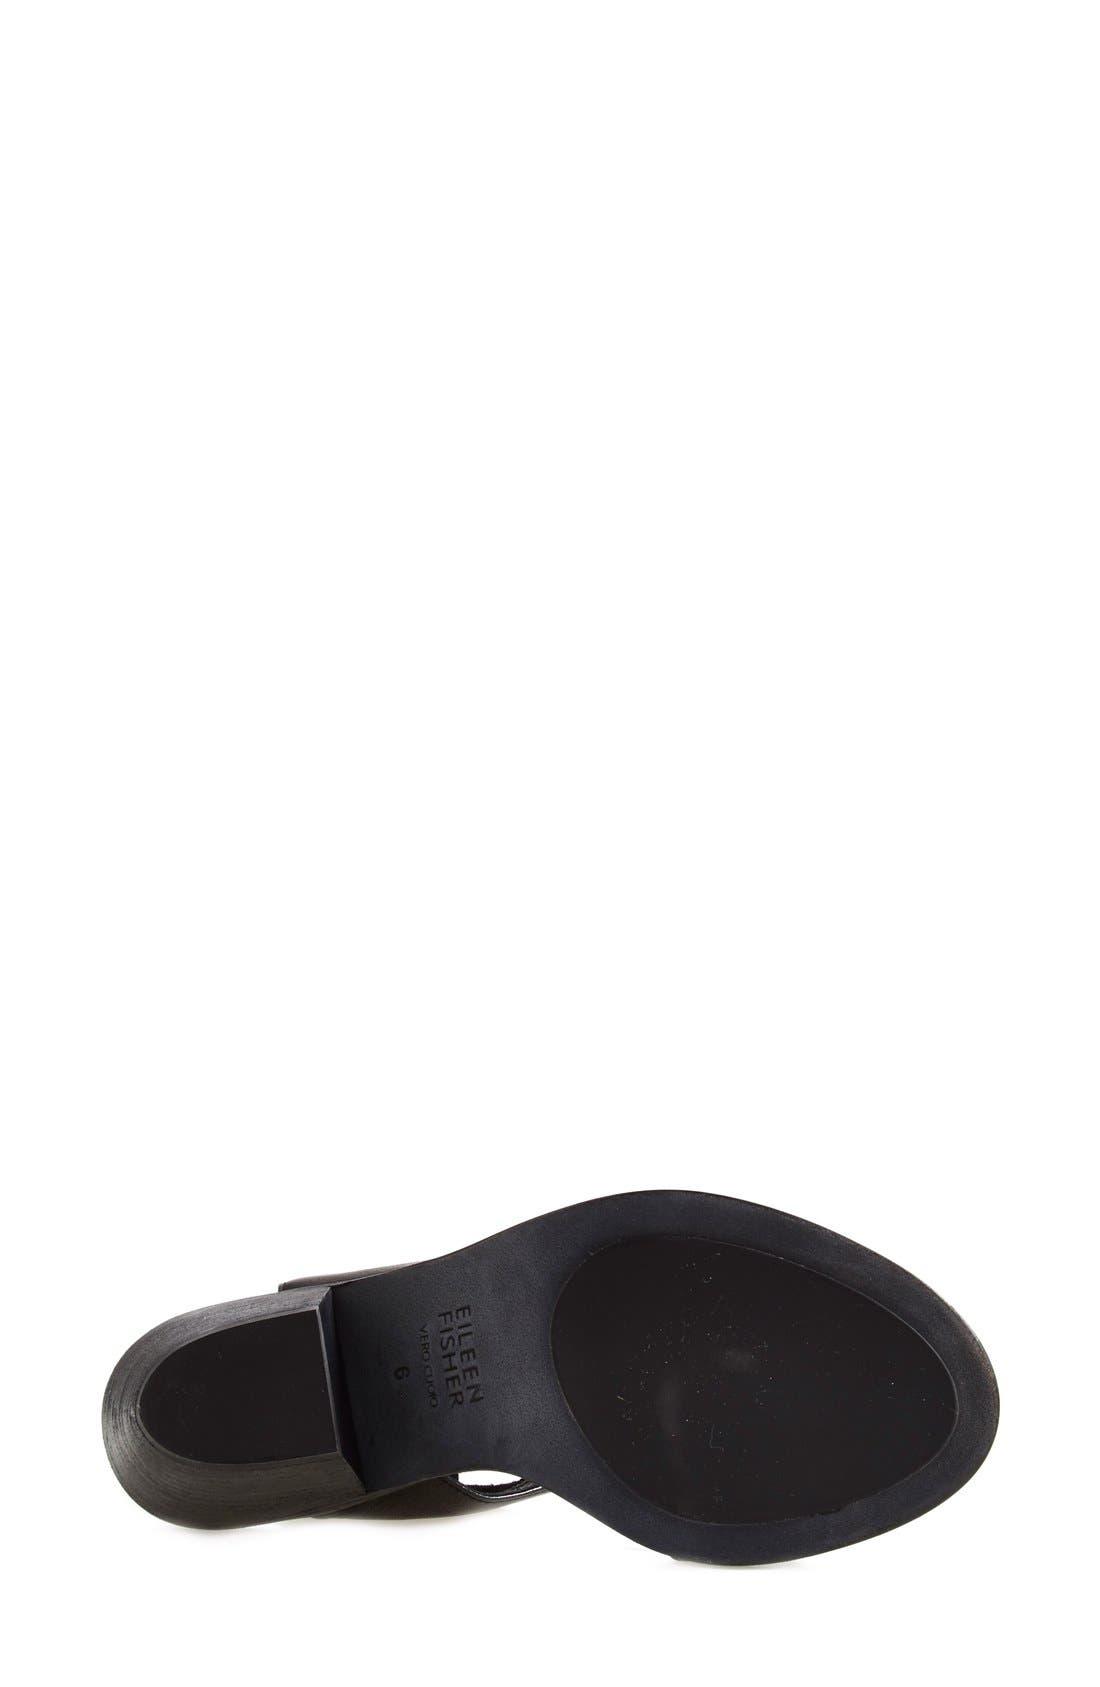 'Art' Tumbled Leather Ankle Cuff Sandal,                             Alternate thumbnail 4, color,                             Black